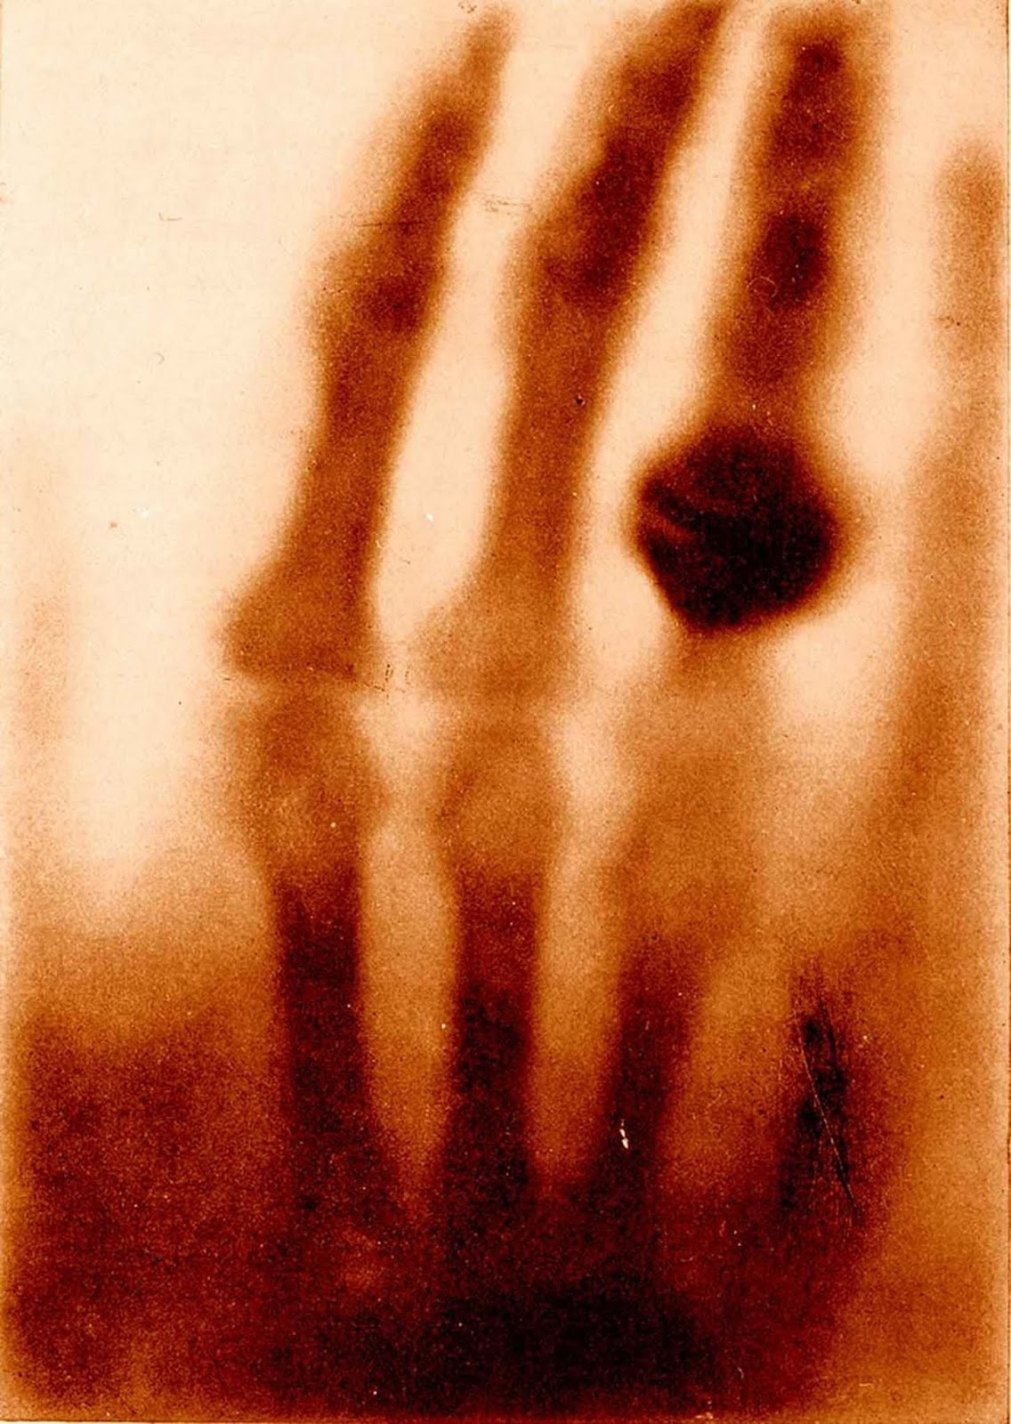 The Hand of Mrs. Wilhelm Röntgen, Wilhelm Conrad Röntgen, 1895